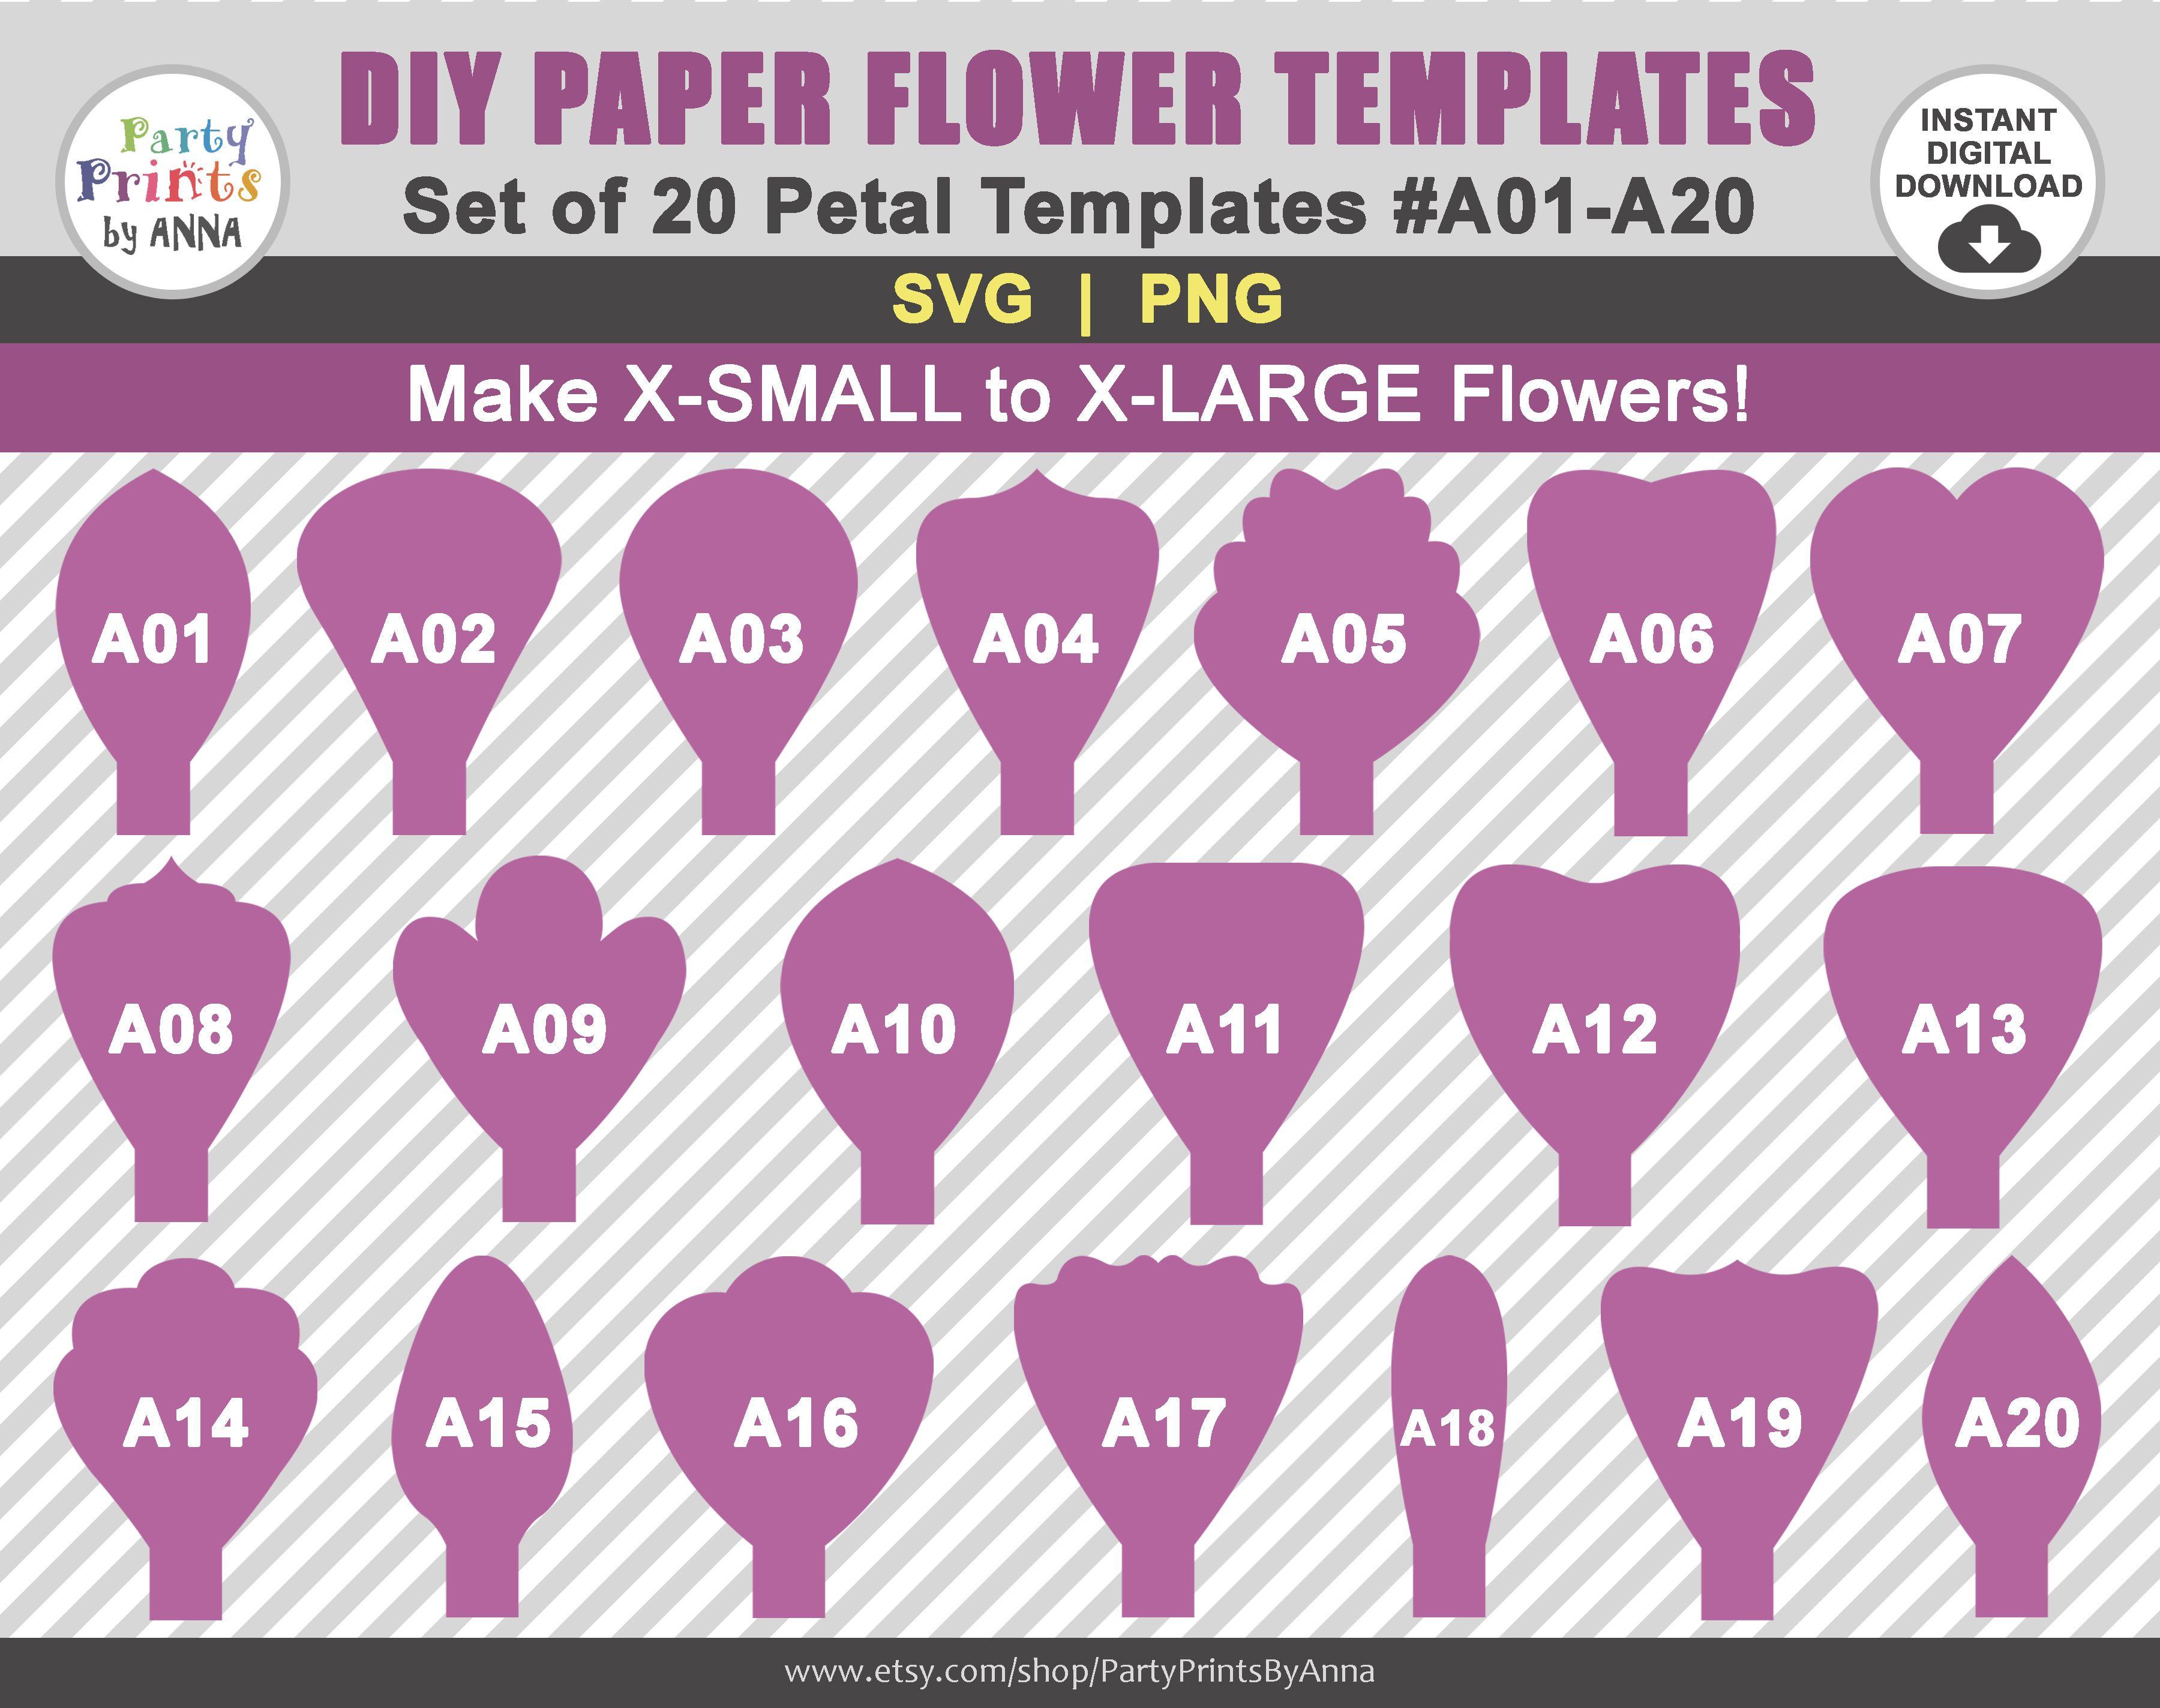 20 Svg Paper Flower Templates Petal Templates A01 A20diy Giant